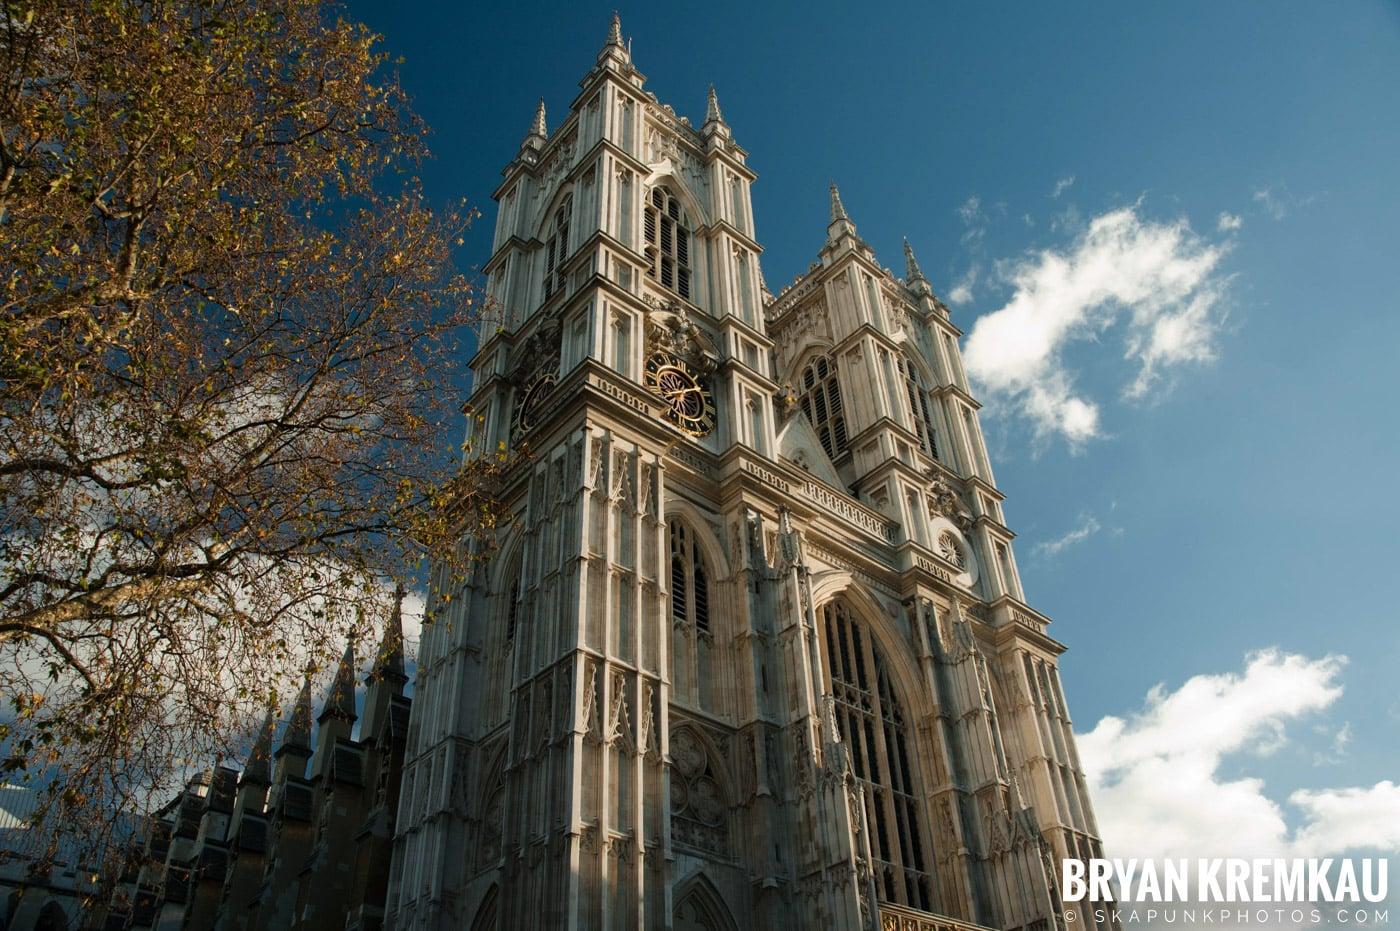 London, England - Day 2 - 12.9.06 (4)